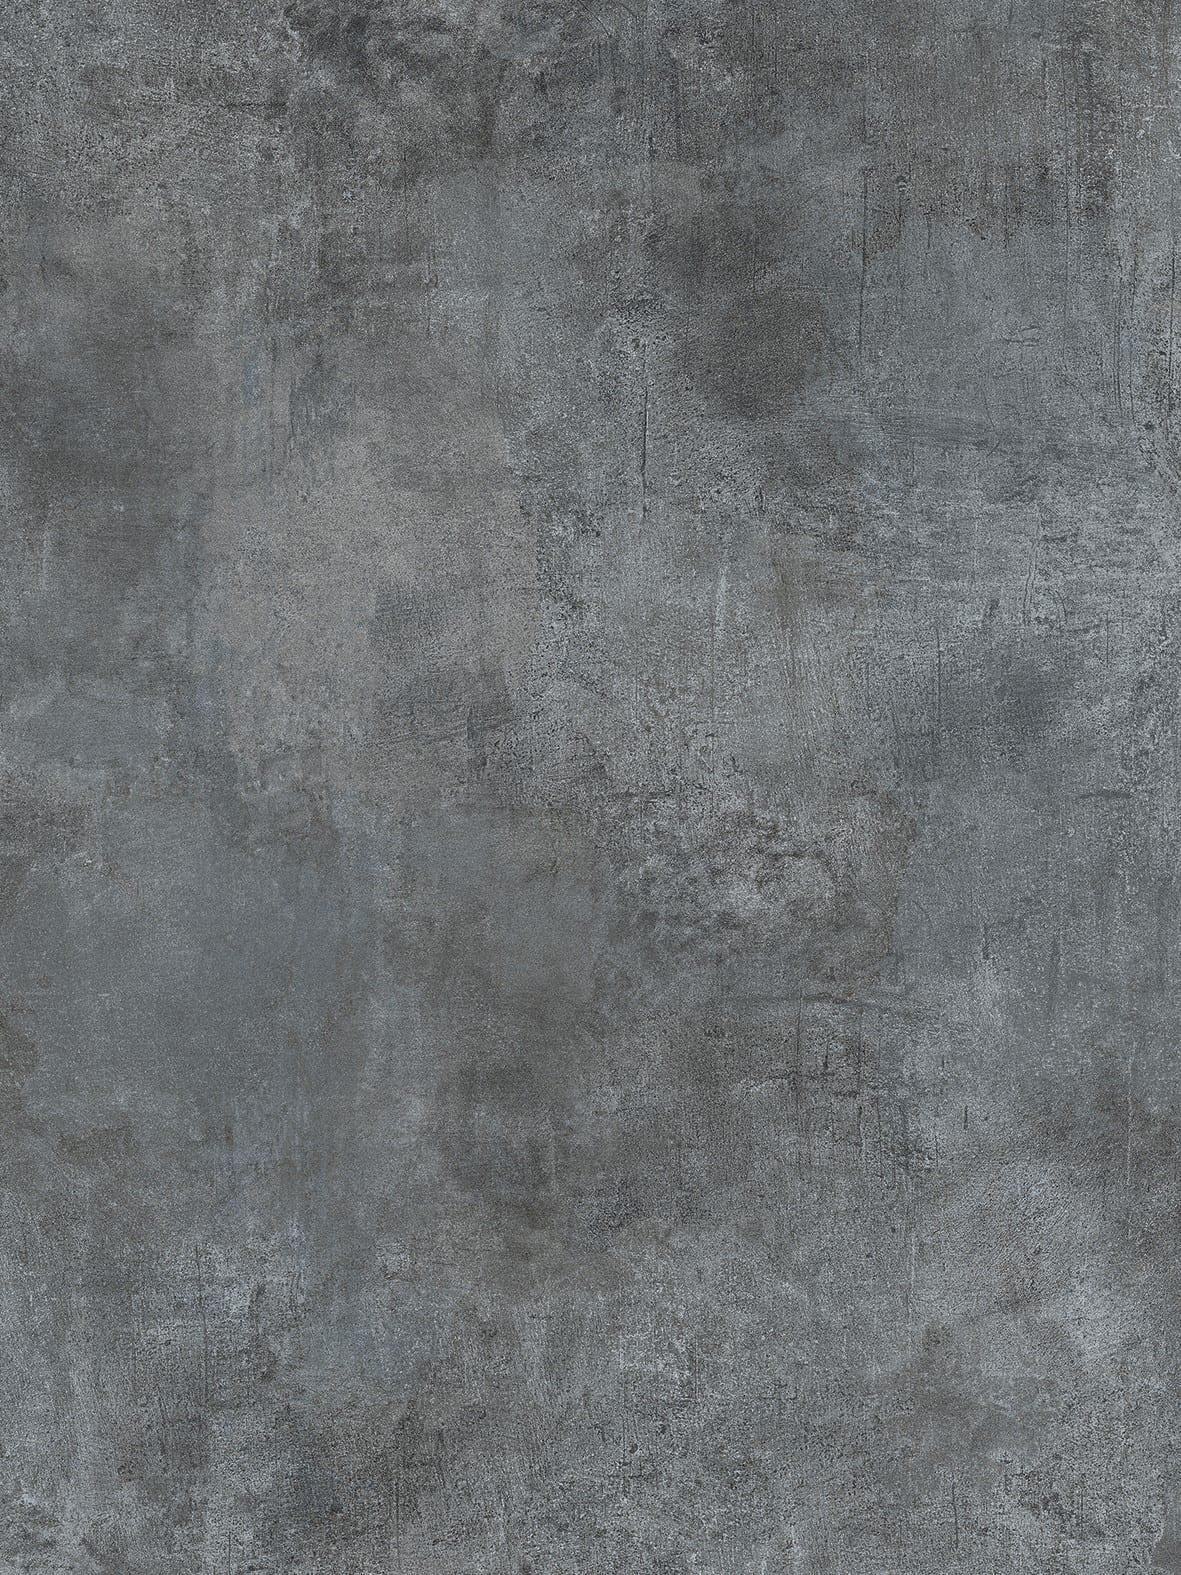 #12 - Cement Black